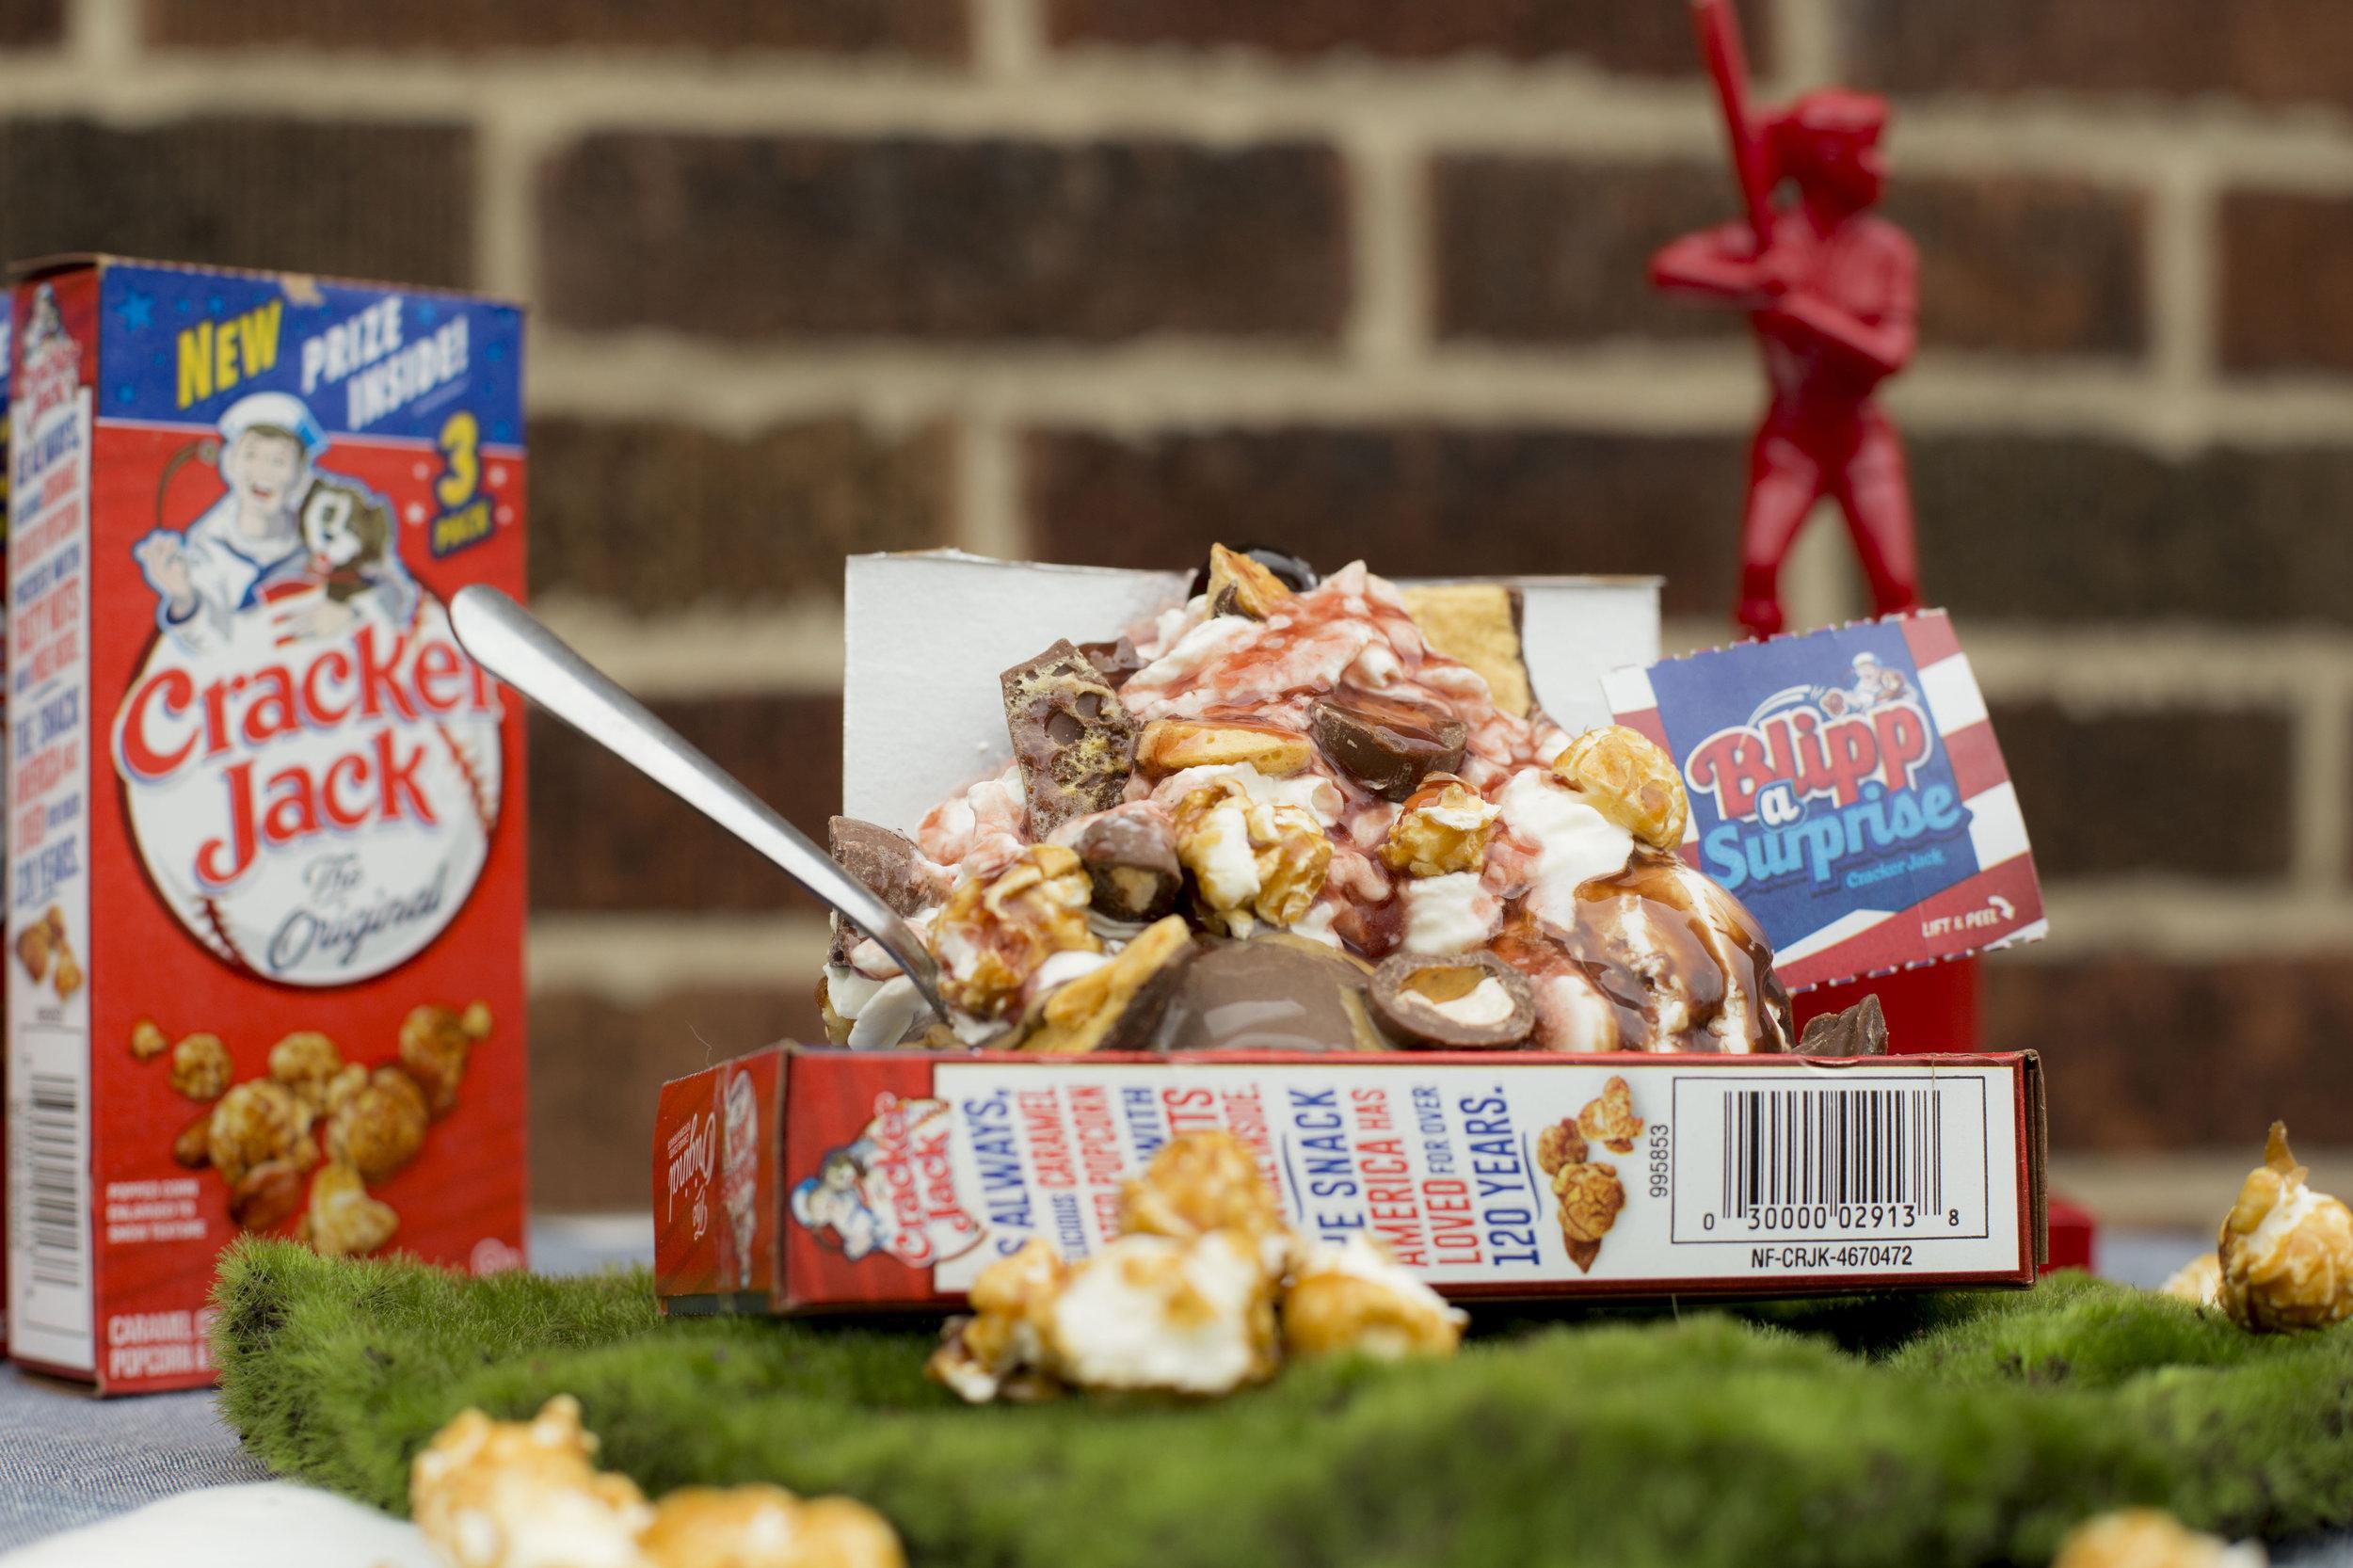 cracker jack sundae with baseball trophy in background